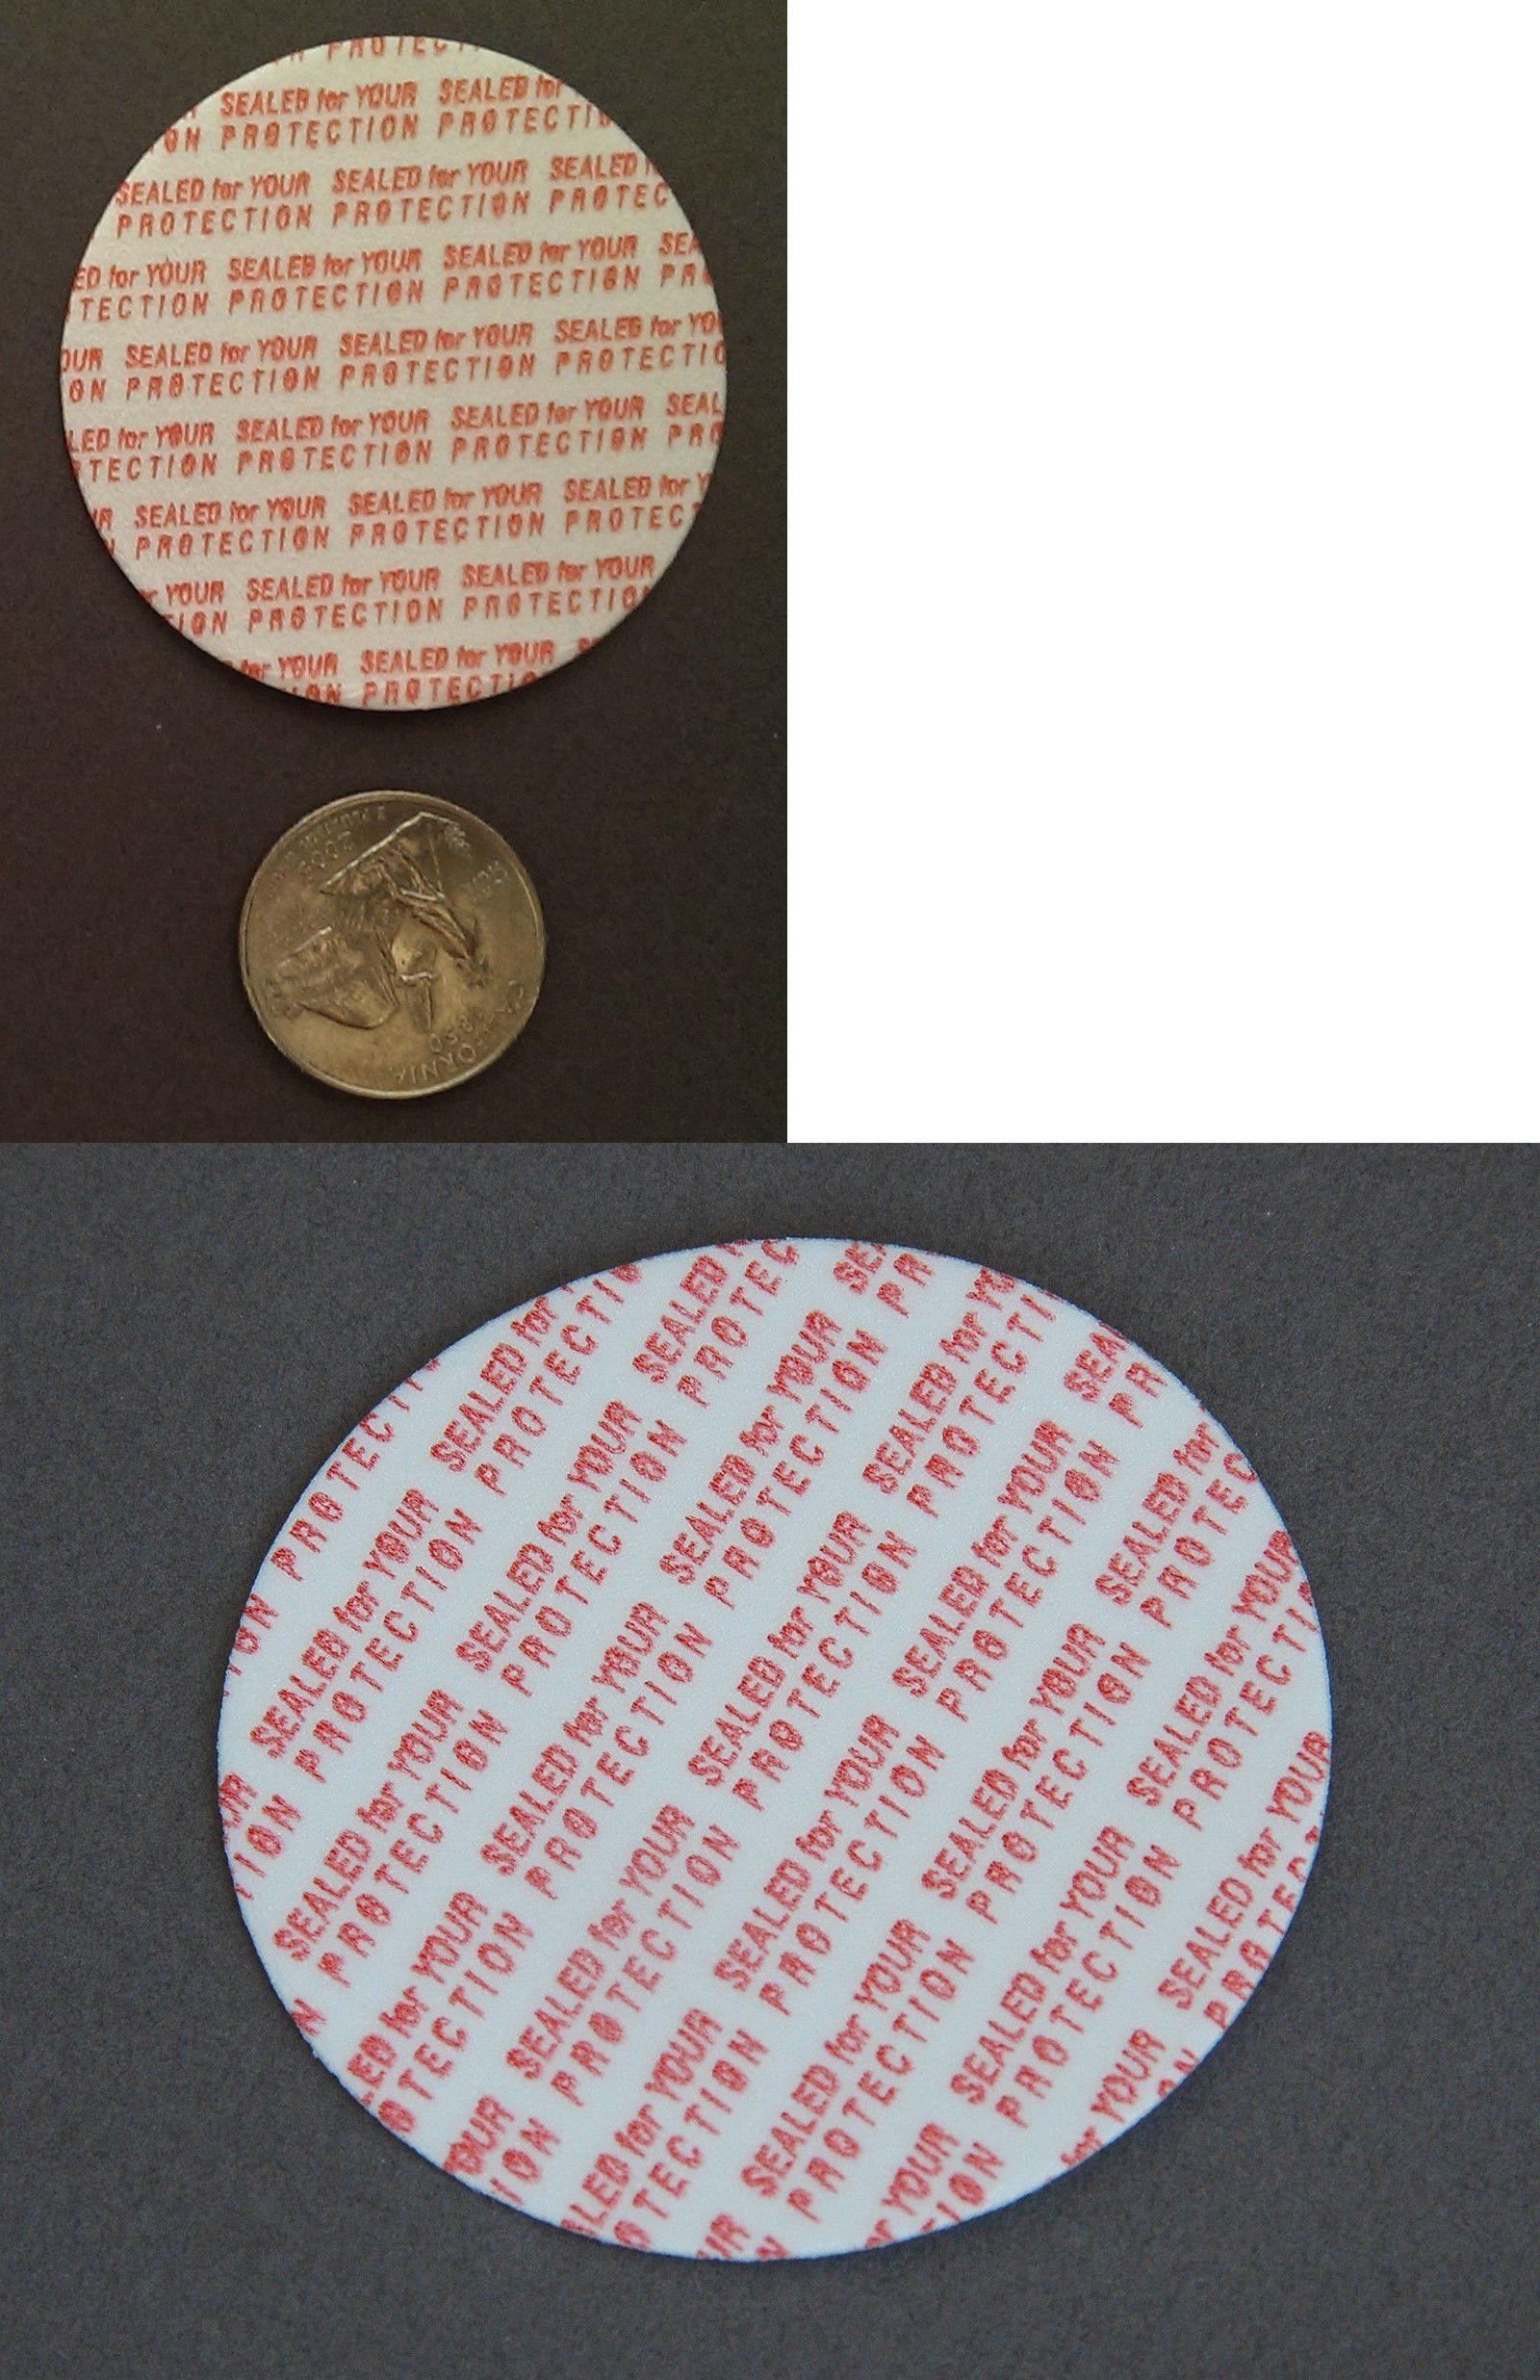 24 mm Press /& Seal Safety Liners made in USA JAR Tamper foam seal 500 bag